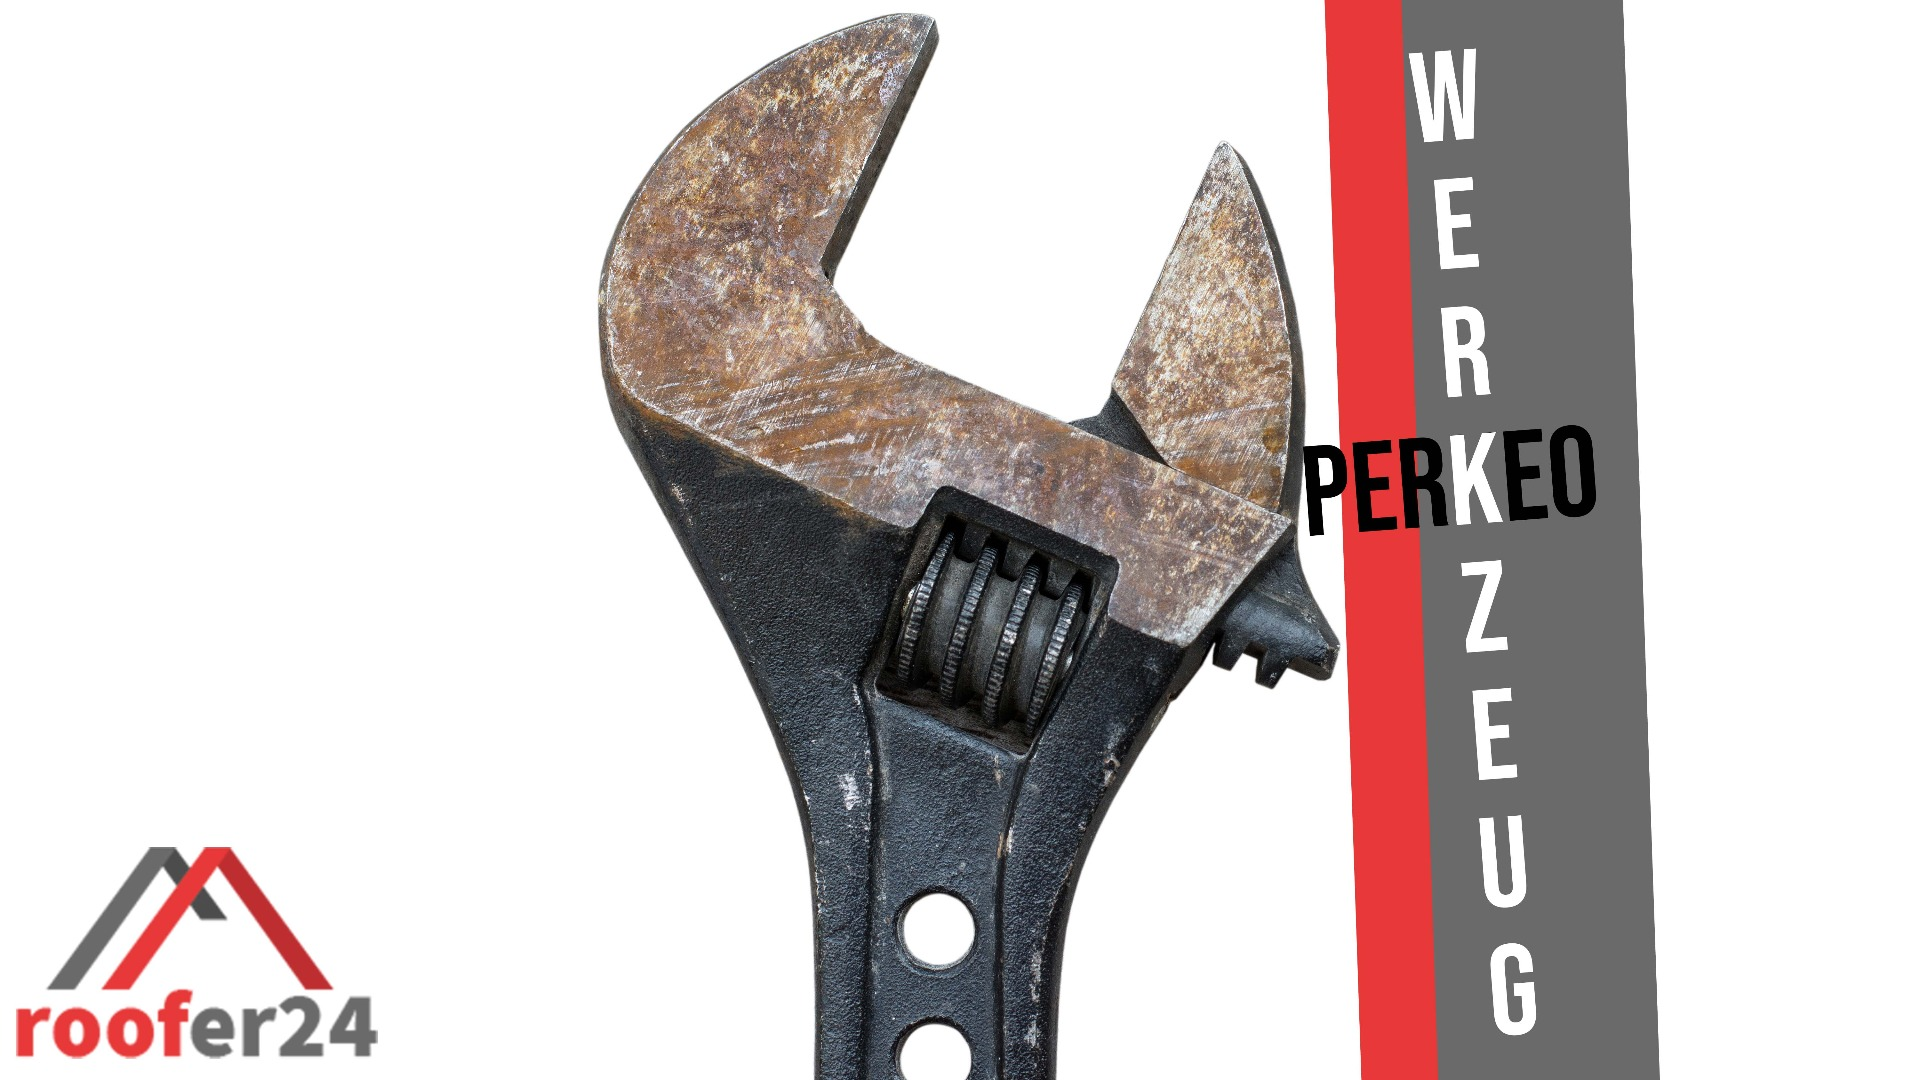 Perkeo_Werkzeug